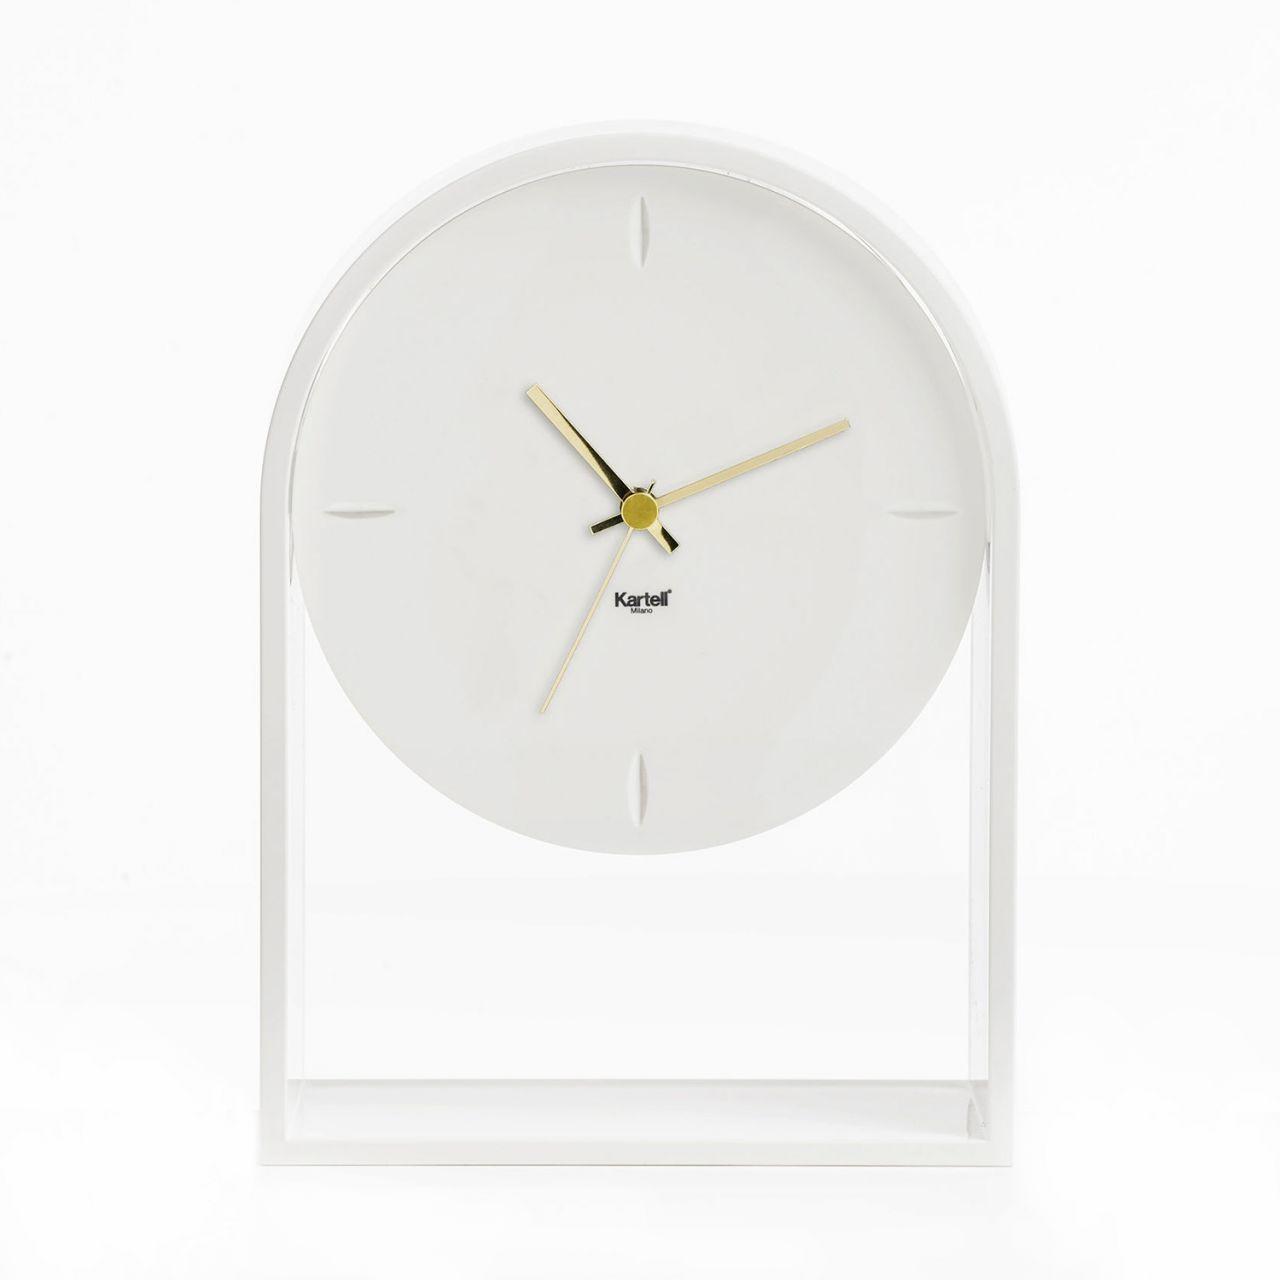 Kartell - Air du Temps Tischstanduhr 01930-03